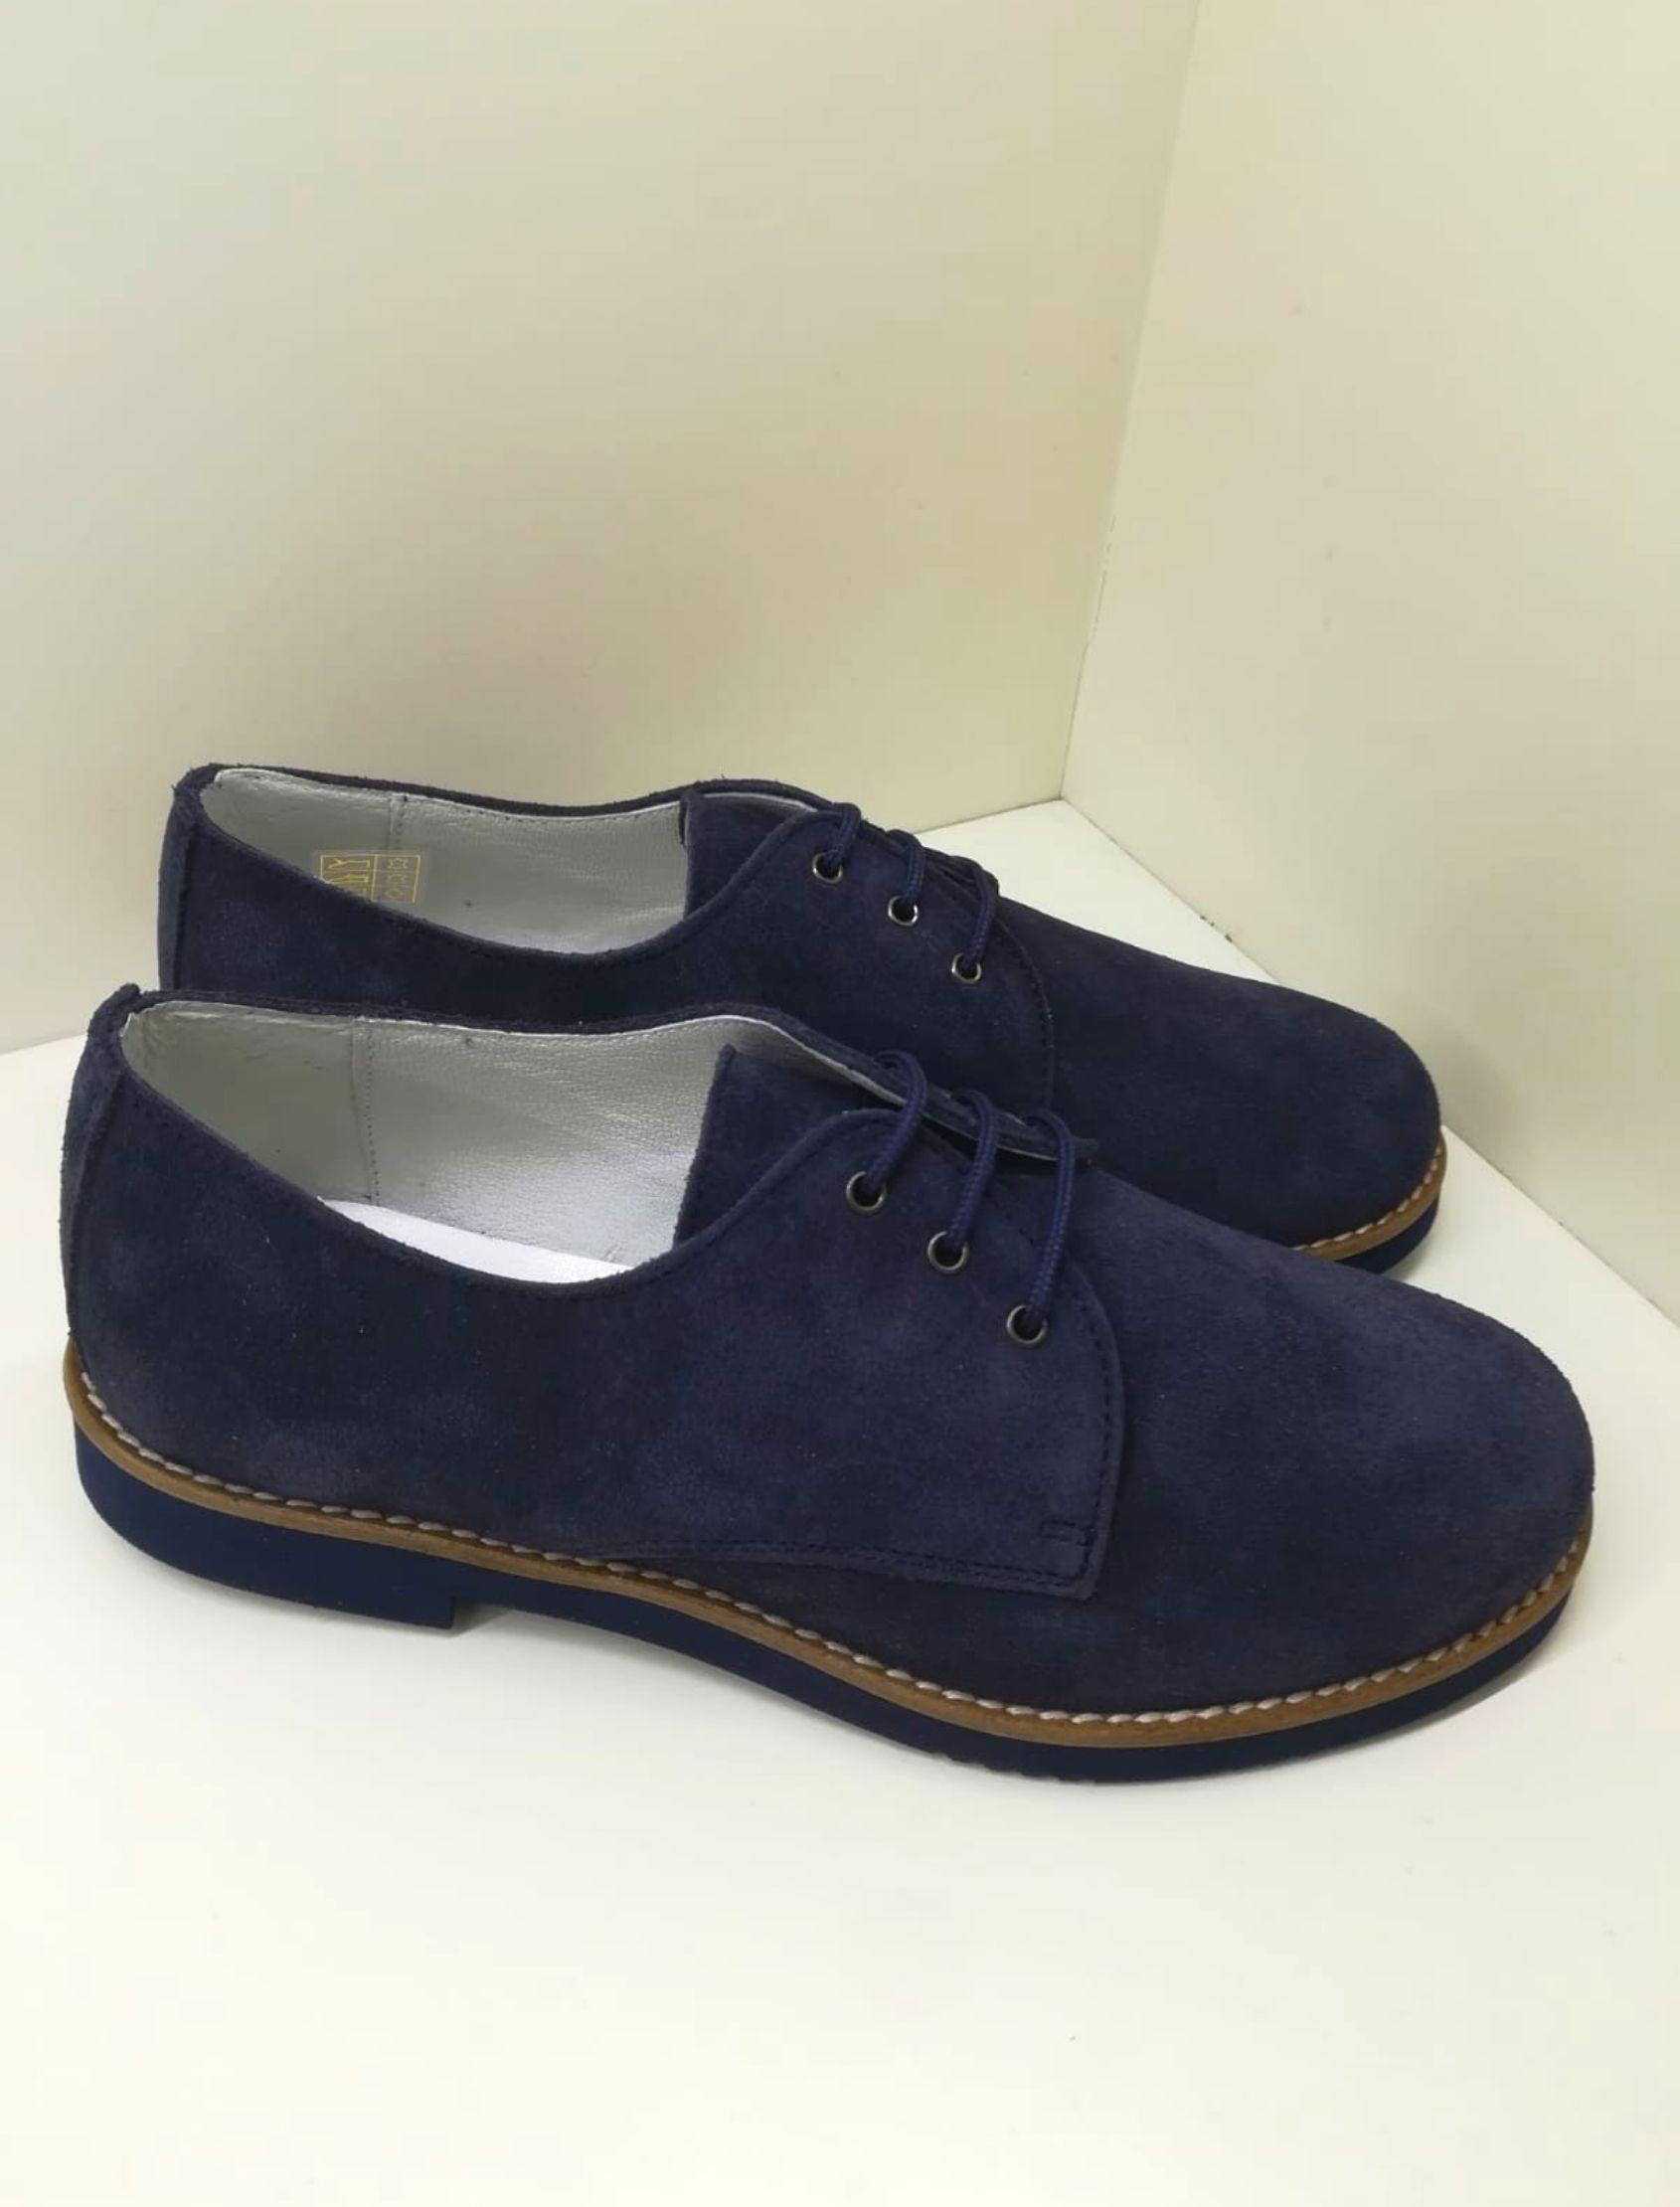 zapato estilo blucher de niño en tono azul marino